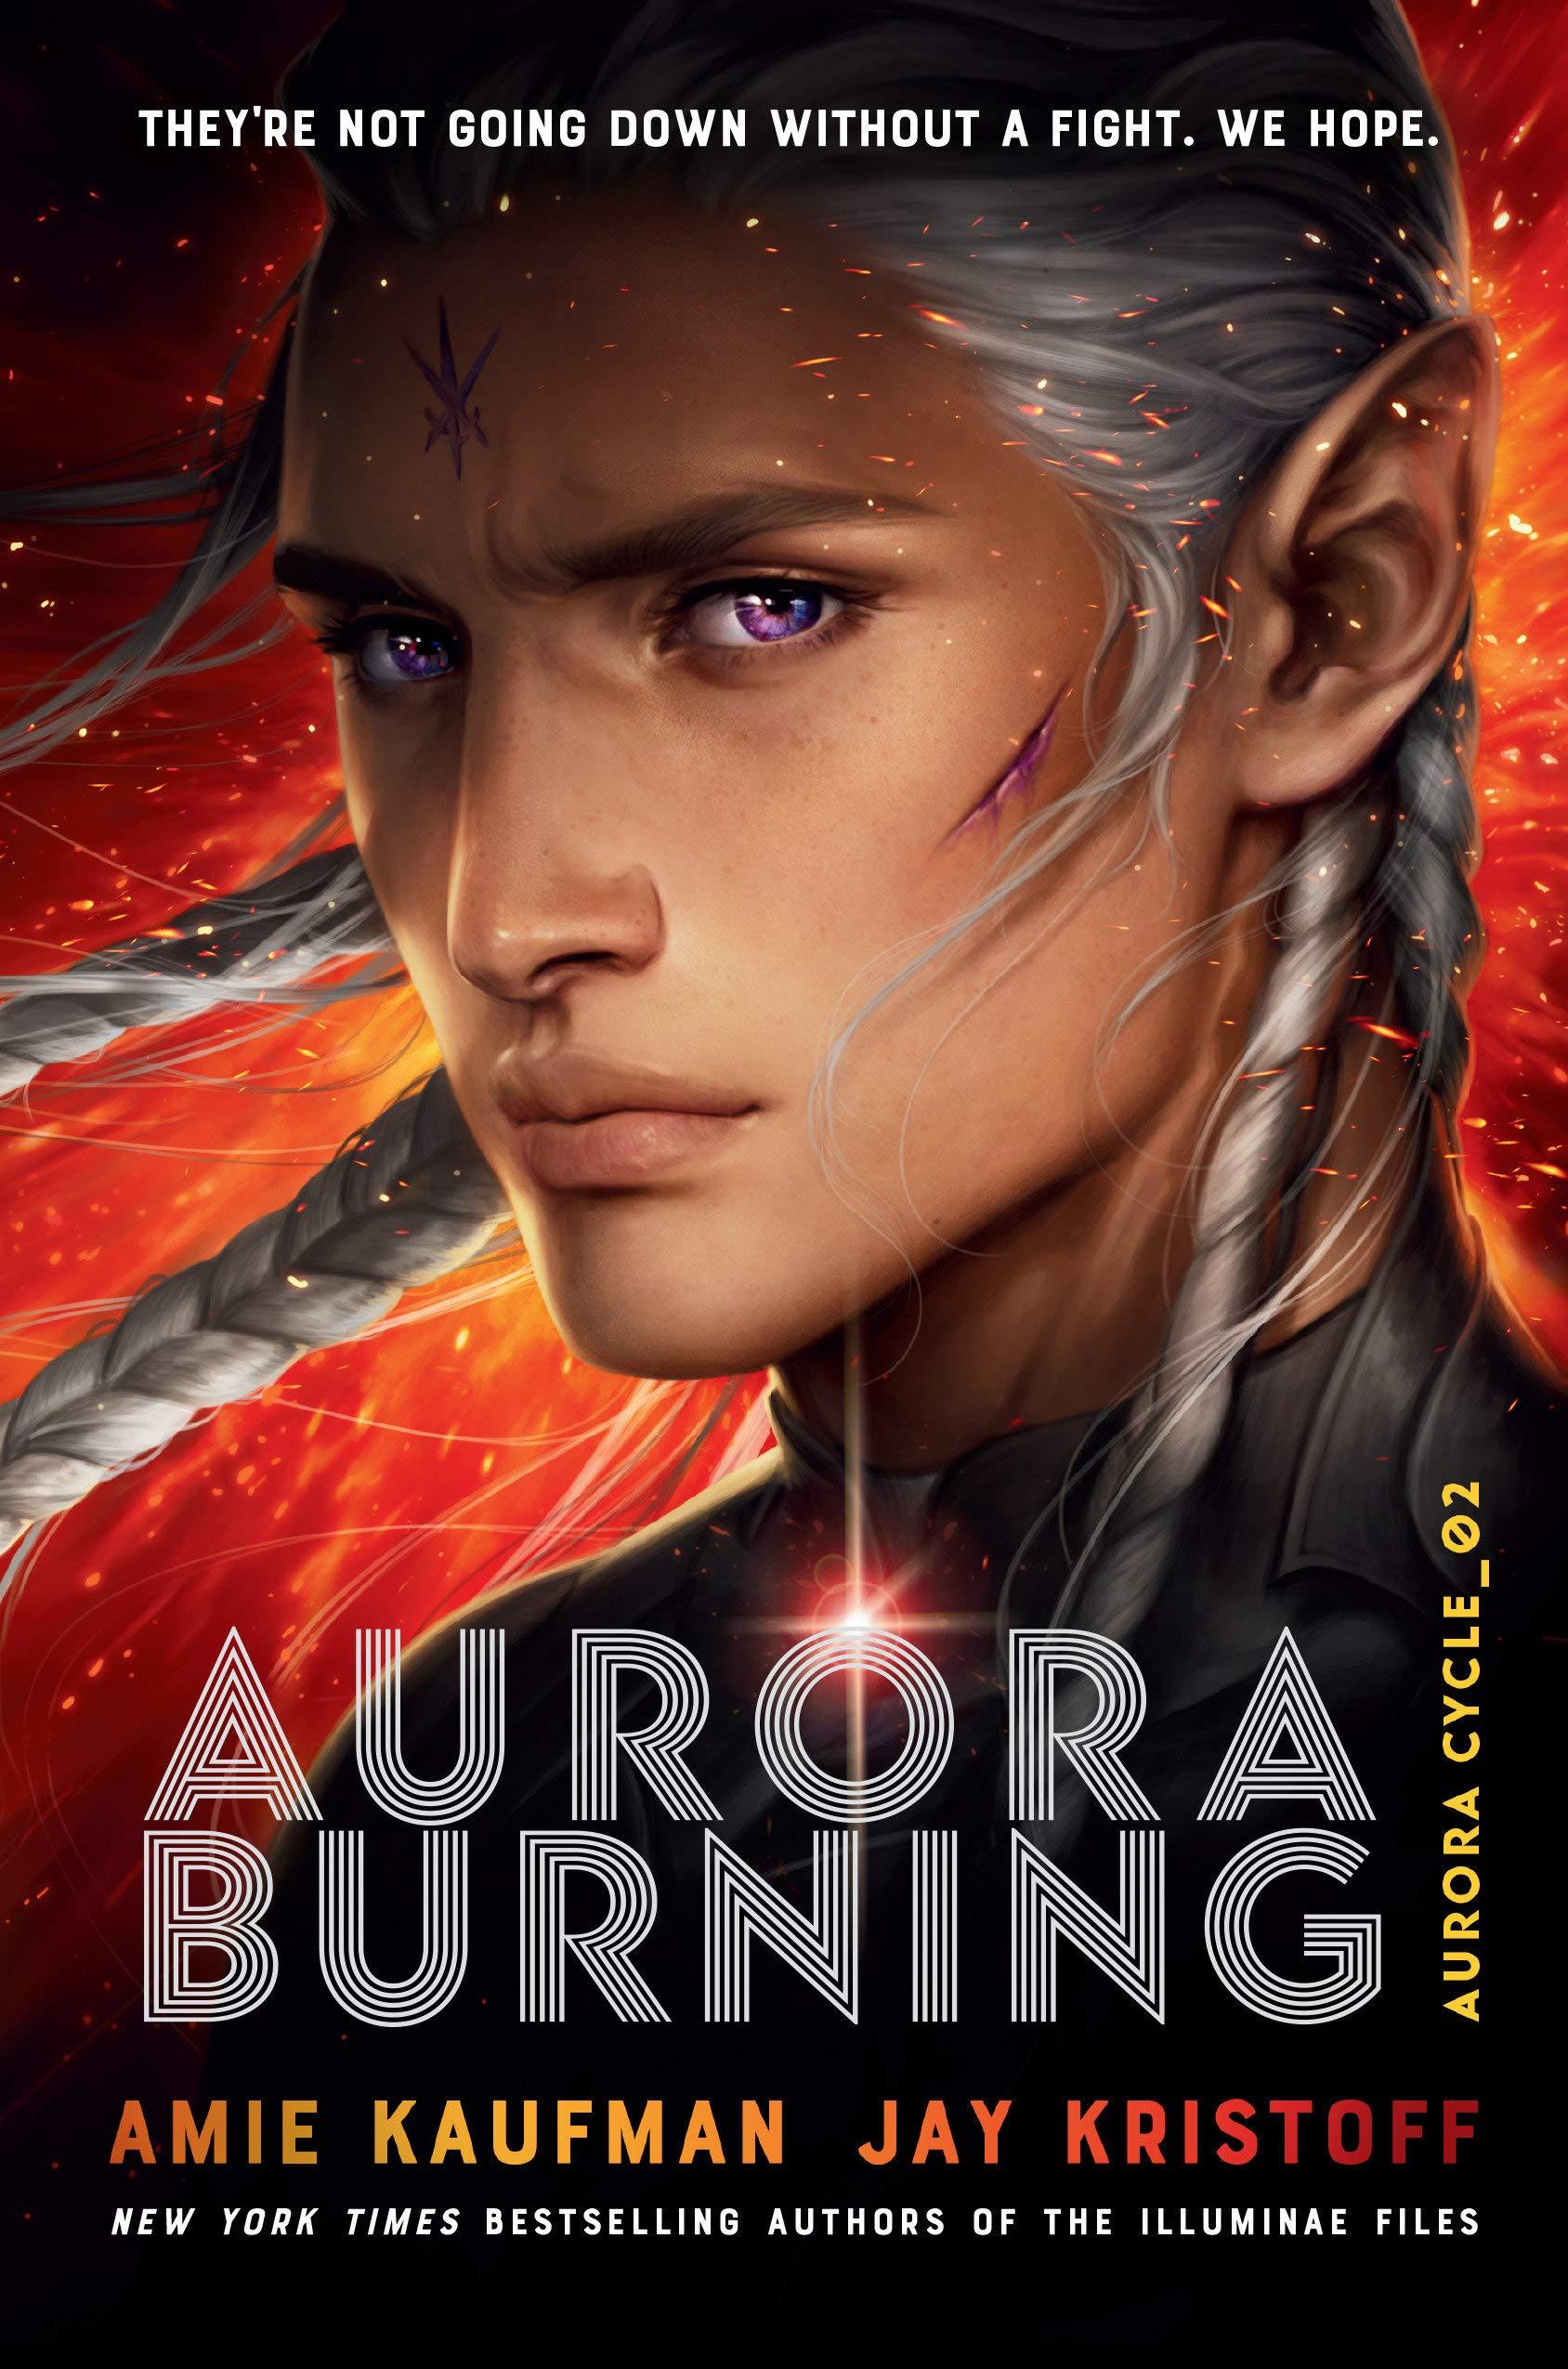 Aurora Burning by Amie Kaufman Jay Kristoff